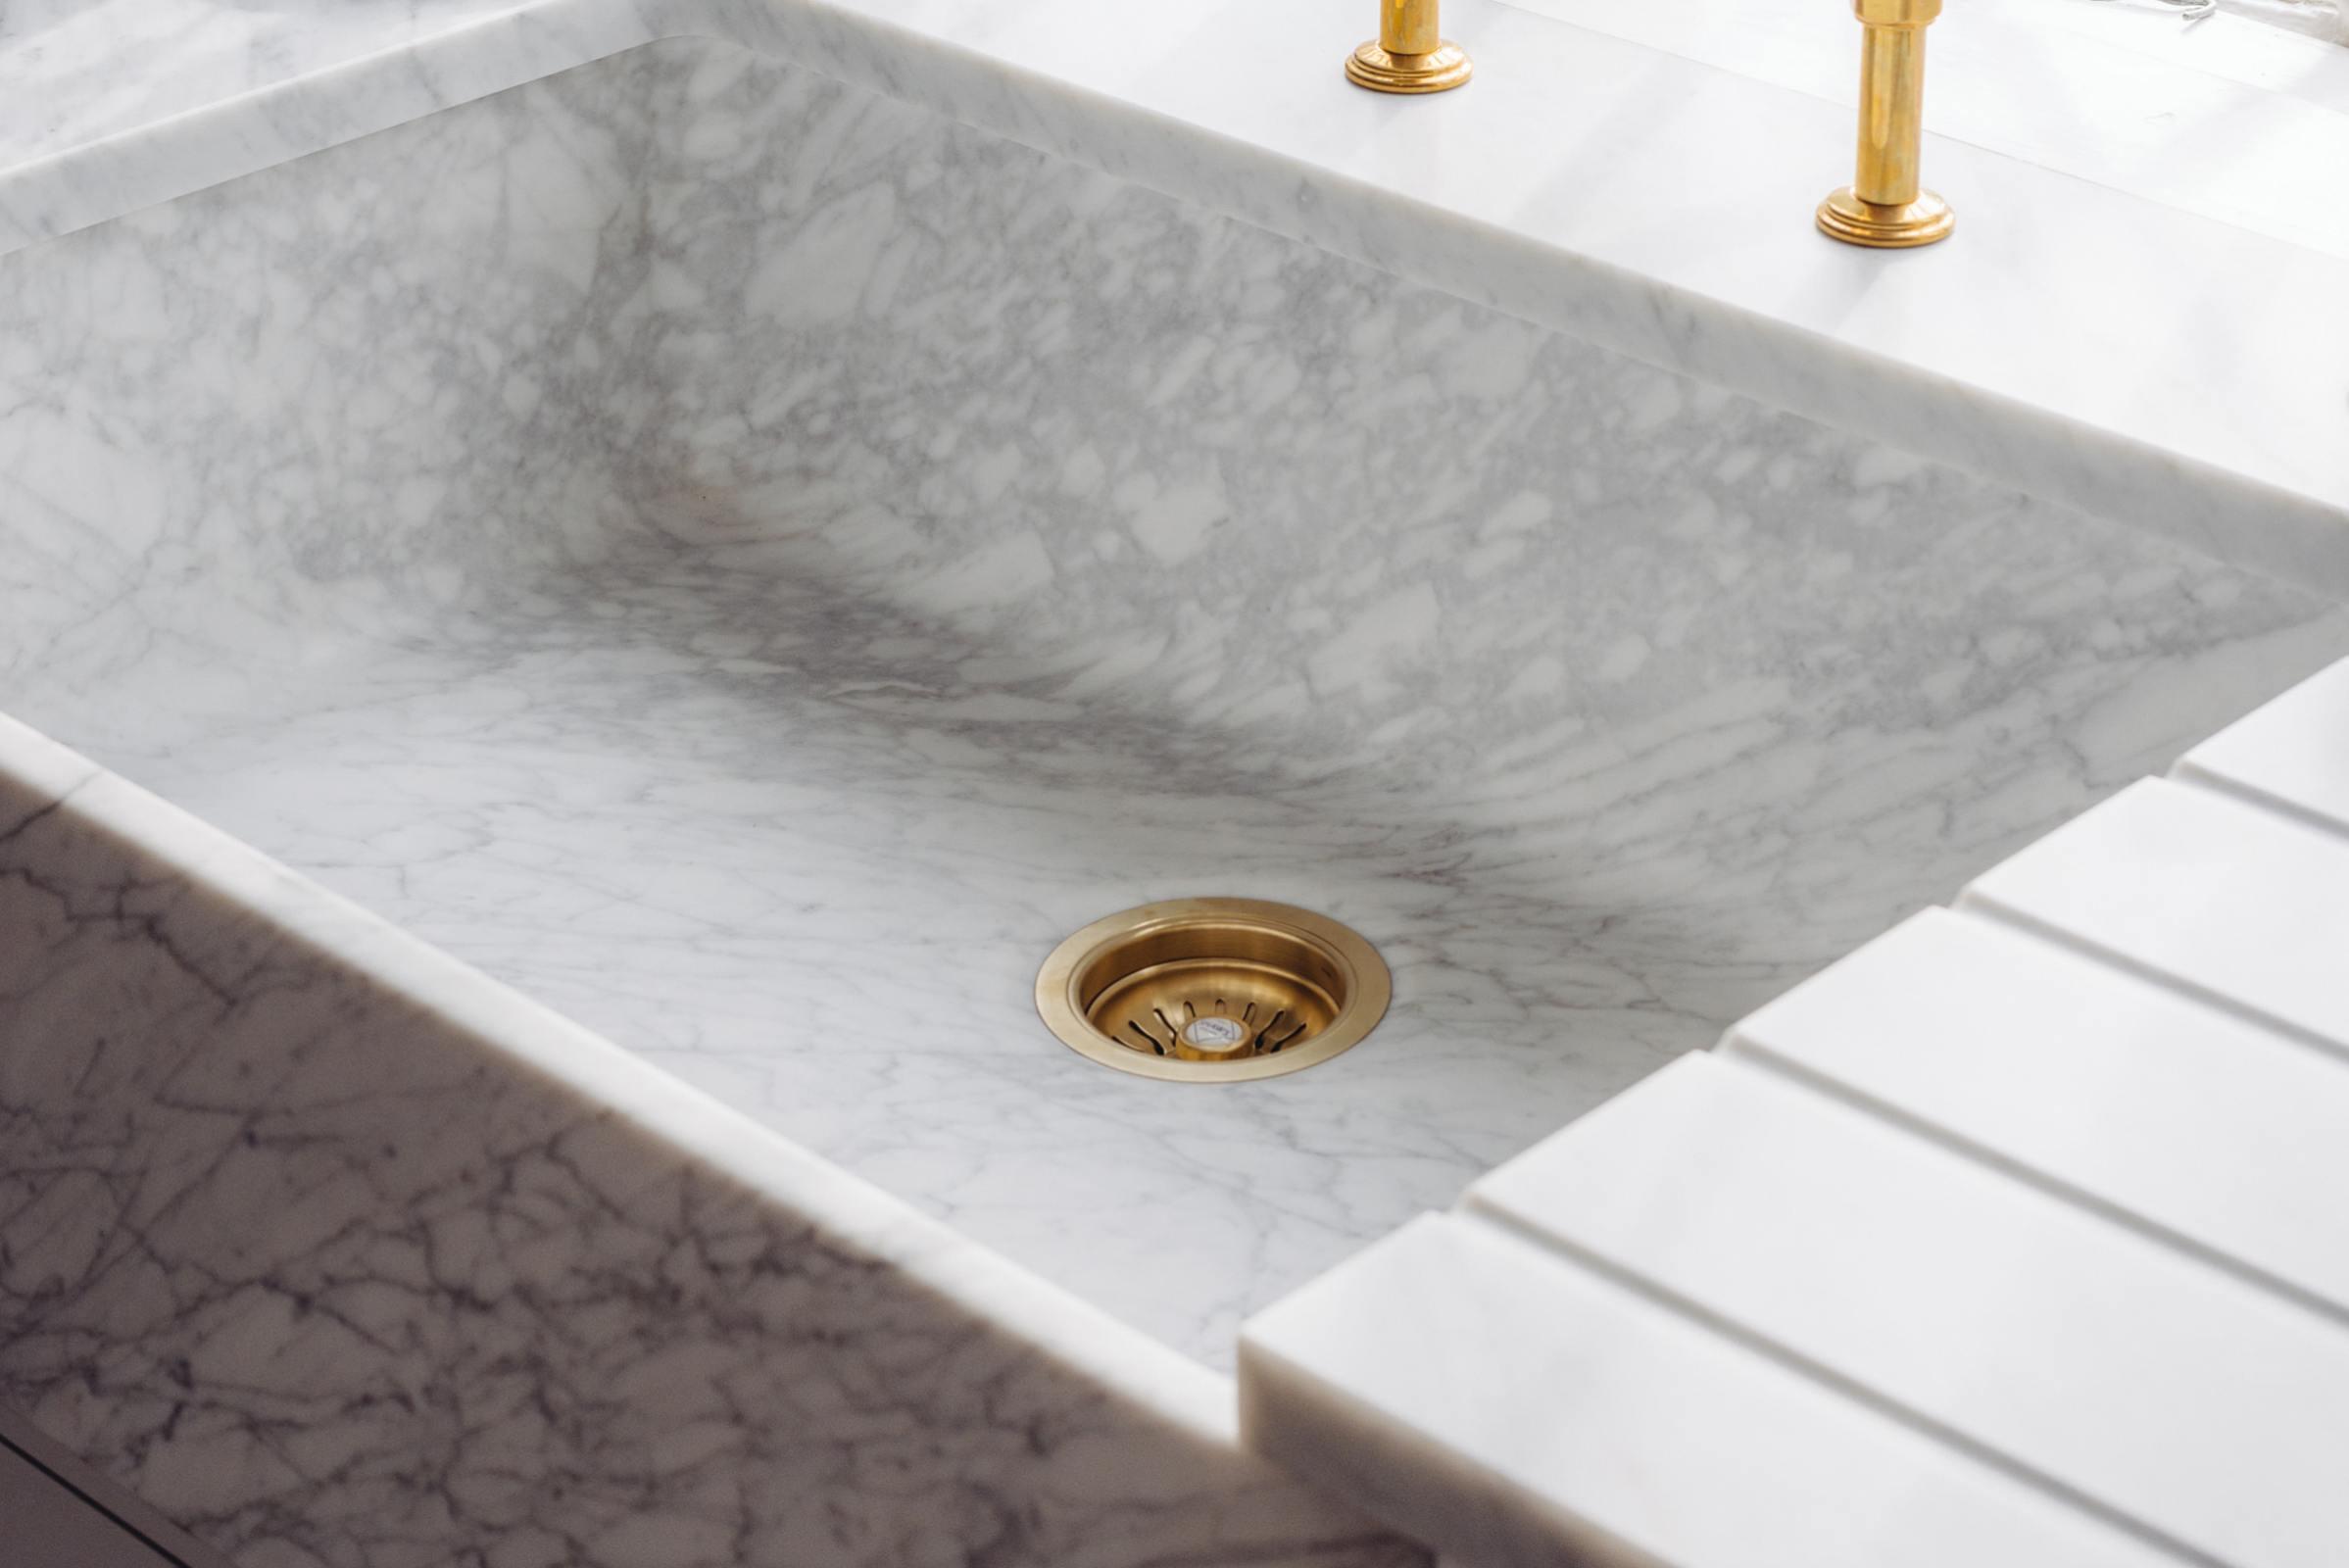 Milano Penthouse 800 Single Marble Sink photo 6